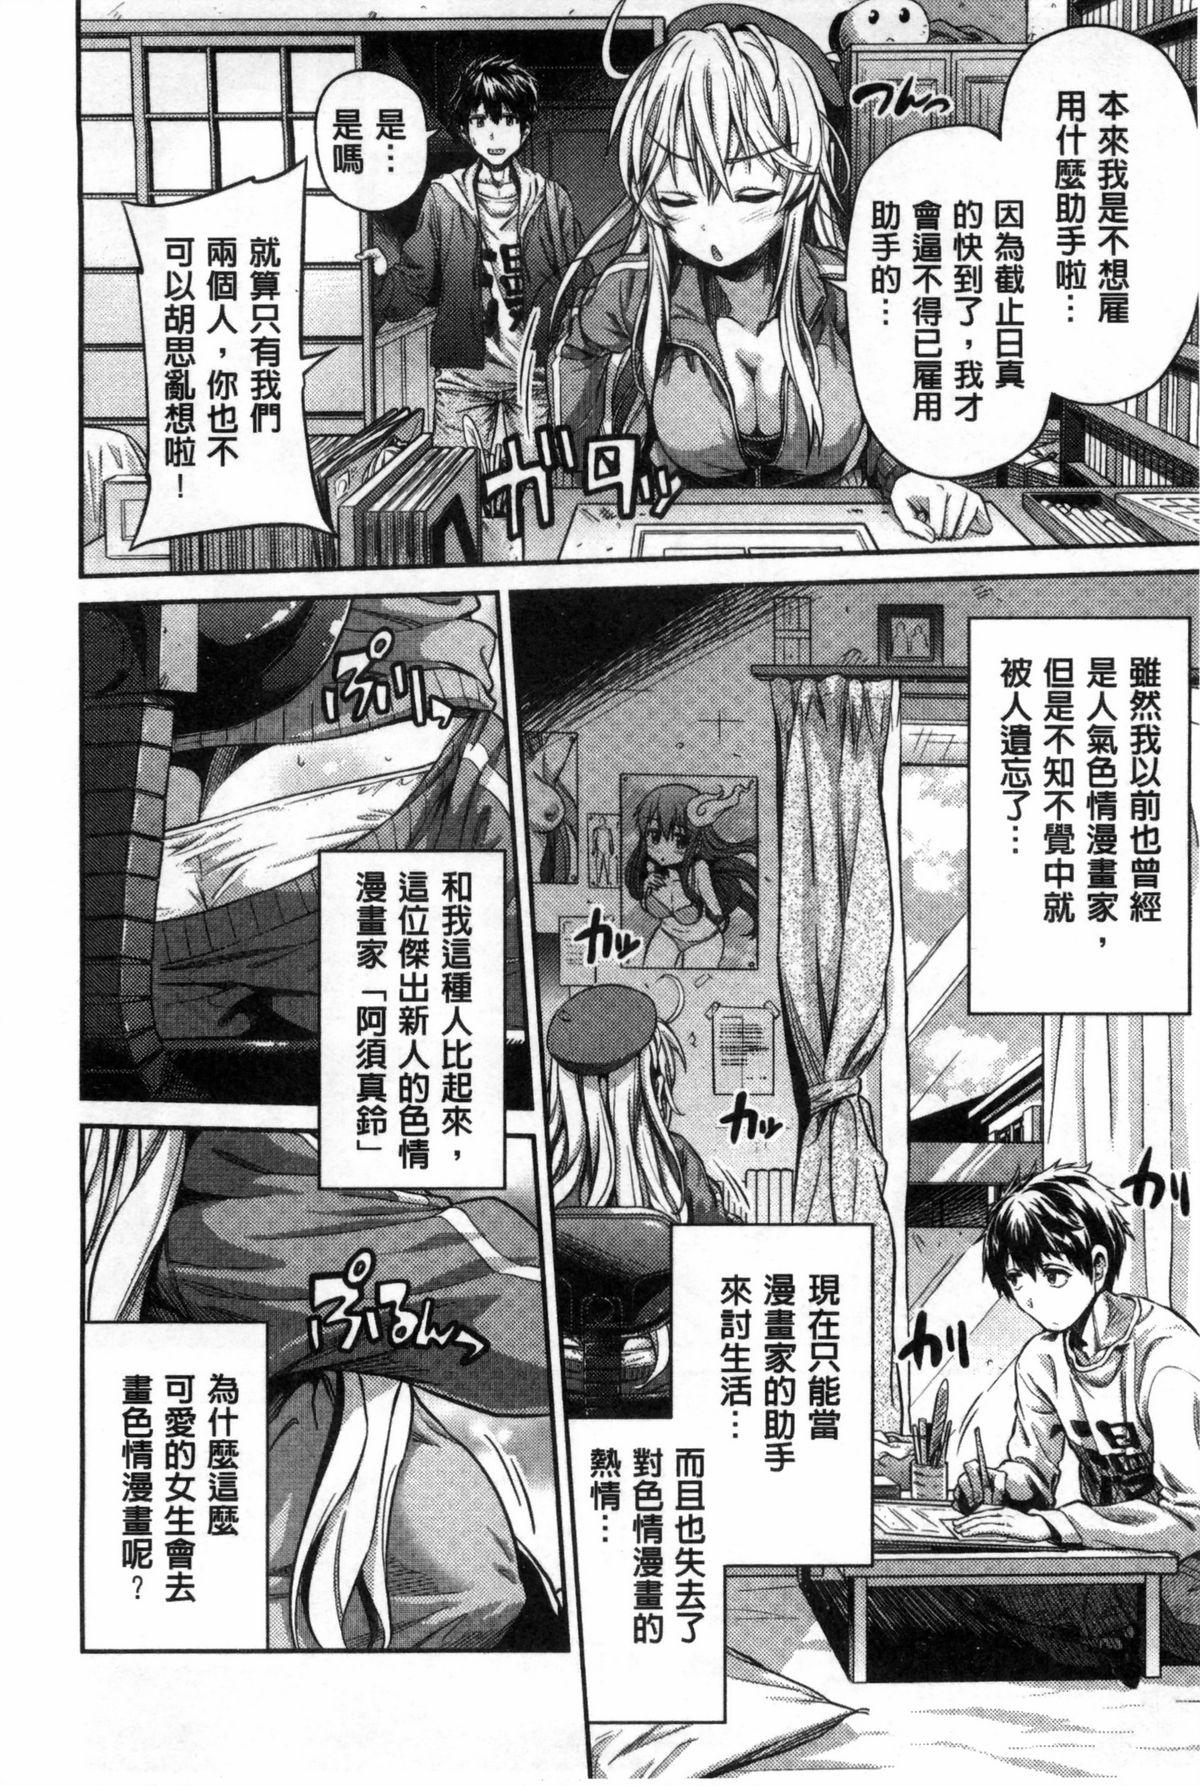 Man x Koi - Ero Manga de Hajimaru Koi no Plot   A漫×戀情 由情色漫畫所萌生的戀之物語 12